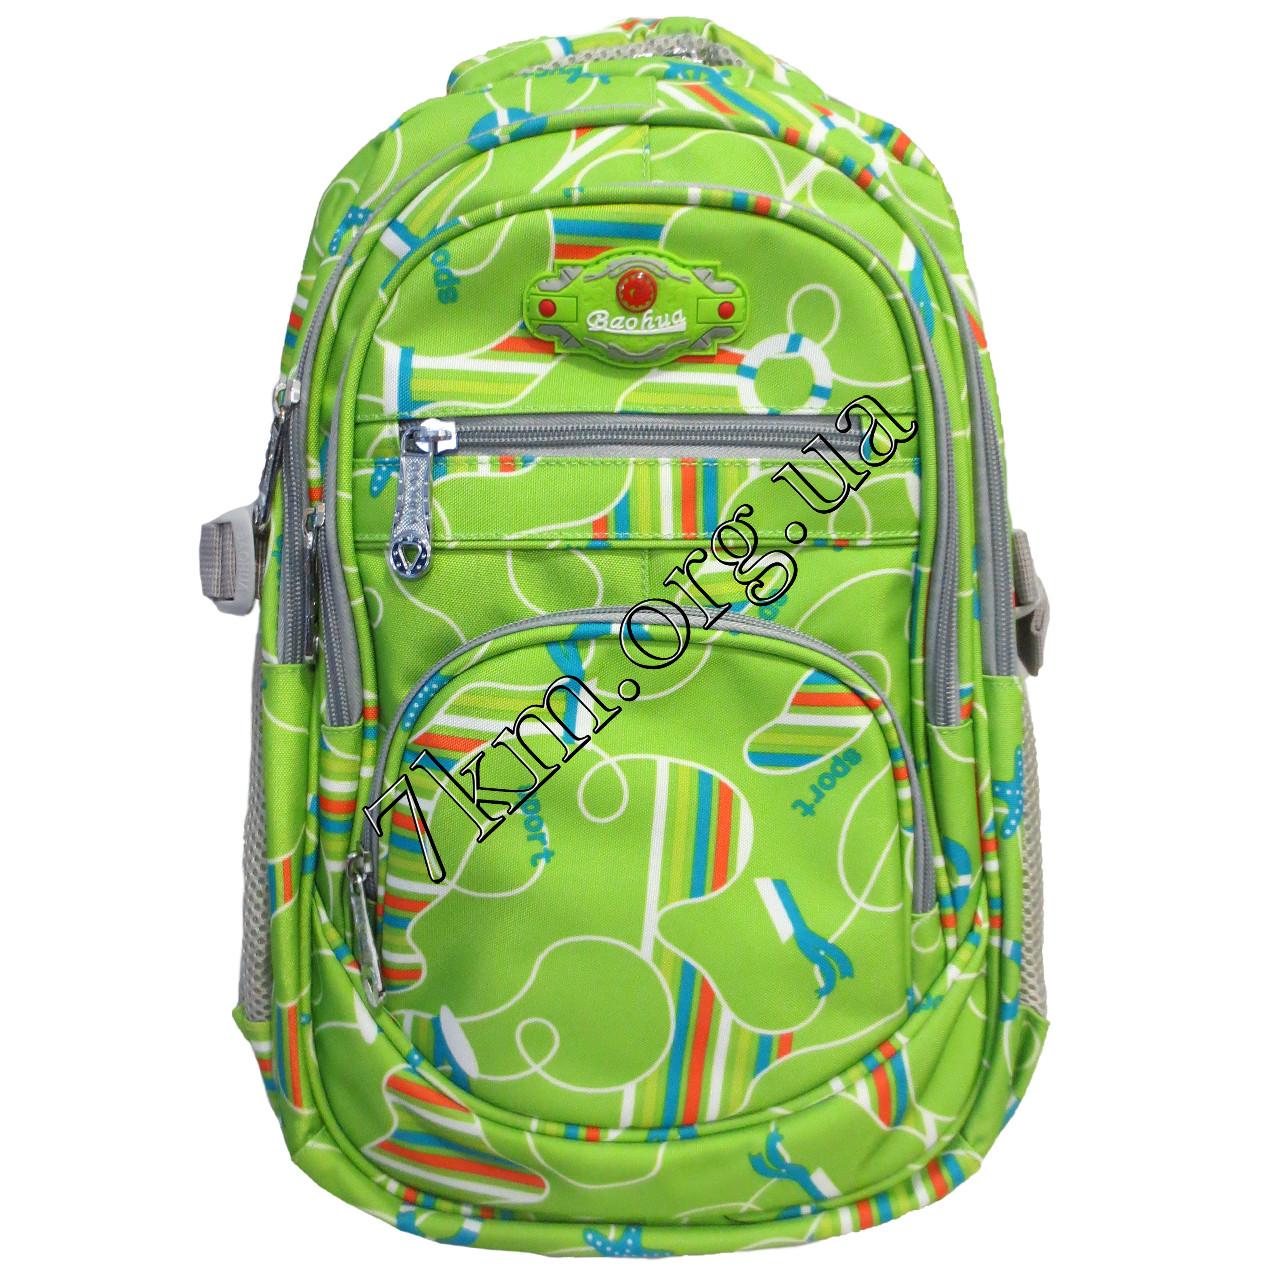 29e2e2903a18 Школьный рюкзак для девочек и мальчиков 40*30 CR BH 0203: продажа ...